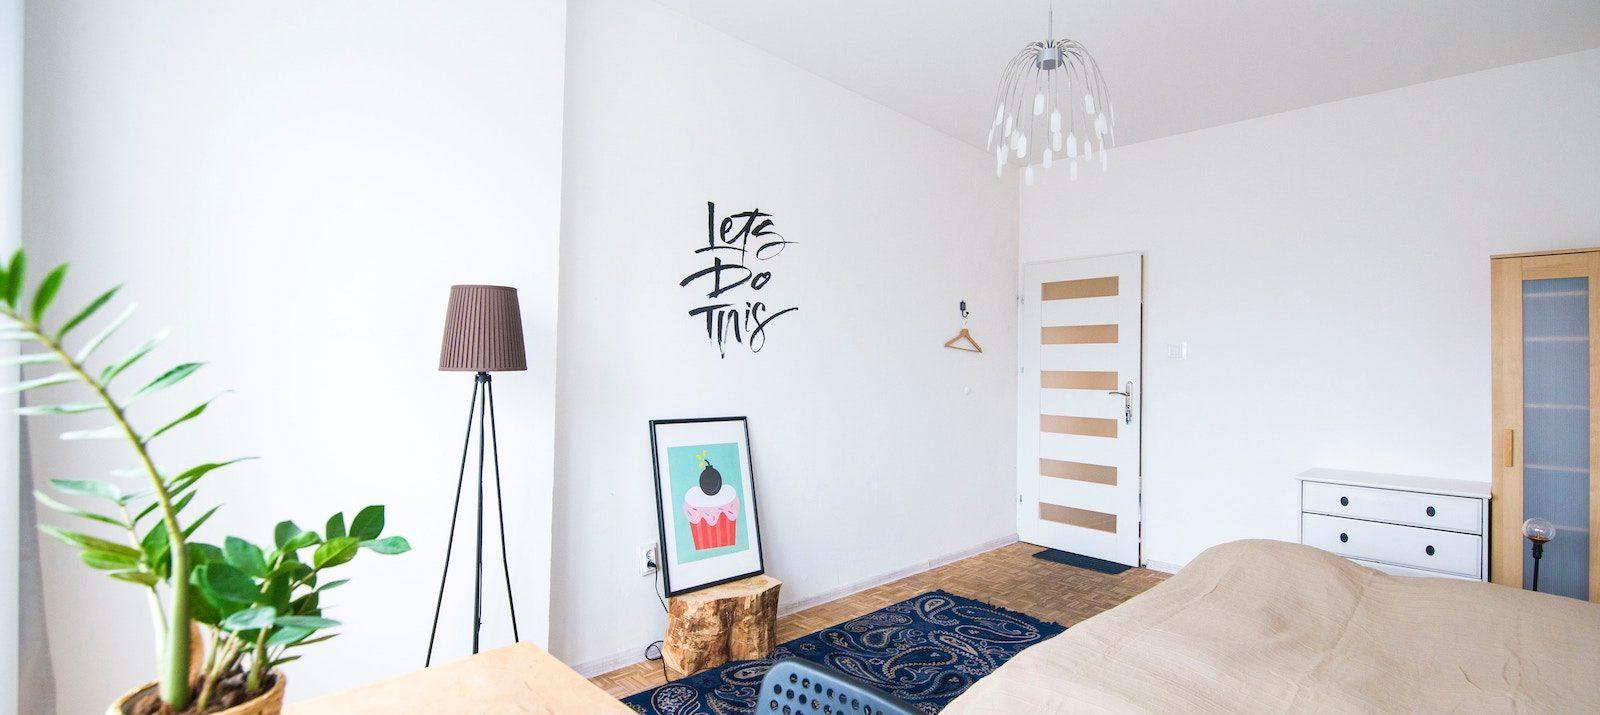 15 Genius Space-Saving Furniture Ideas & Designs For Small